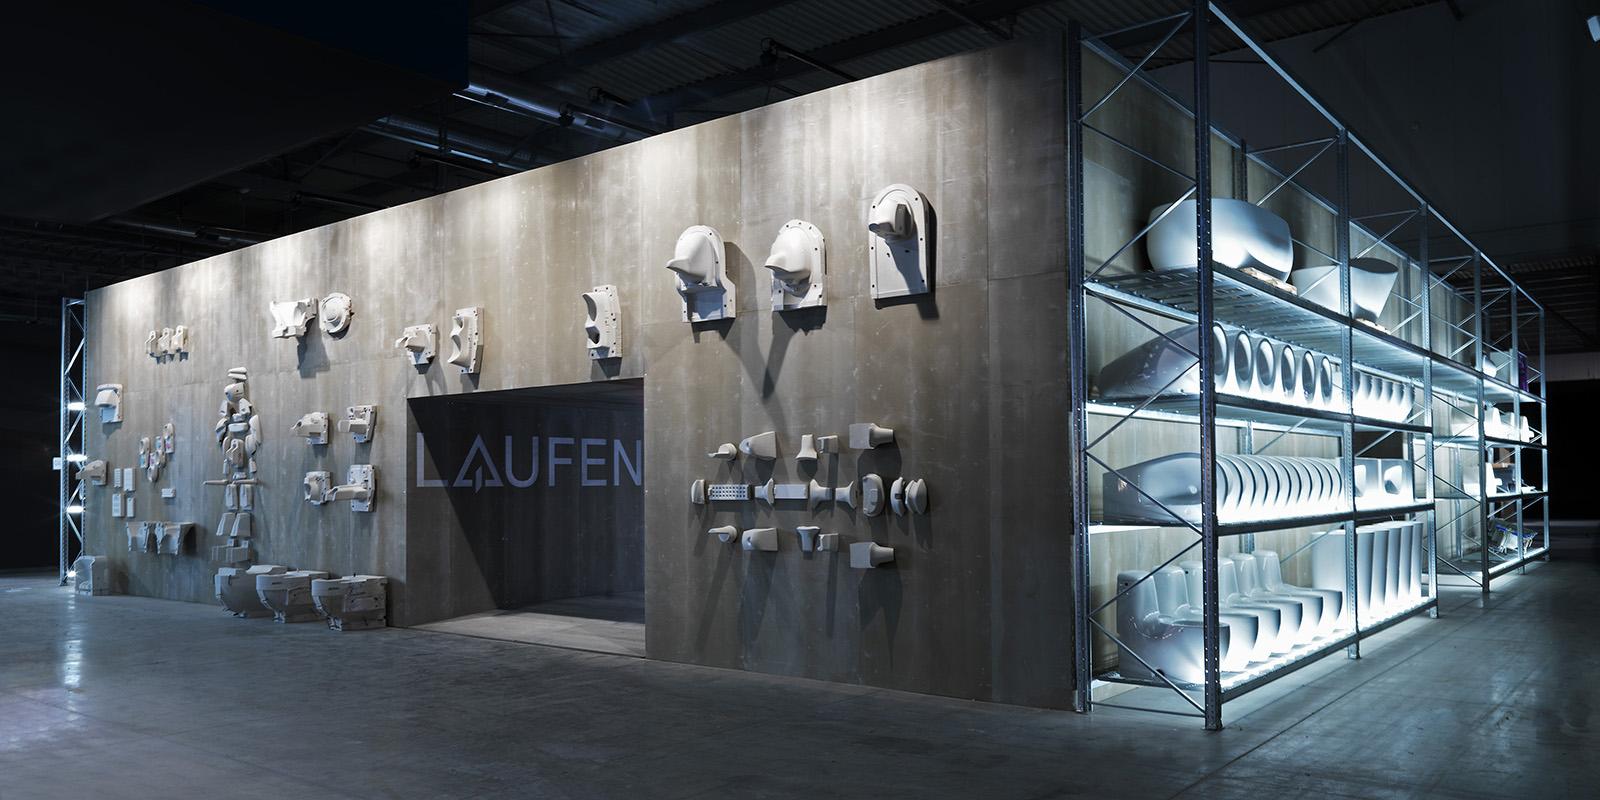 Laufen, Marcel Wanders, Badkamer, Eigentijds, Modern, Bad, Milan Design Week